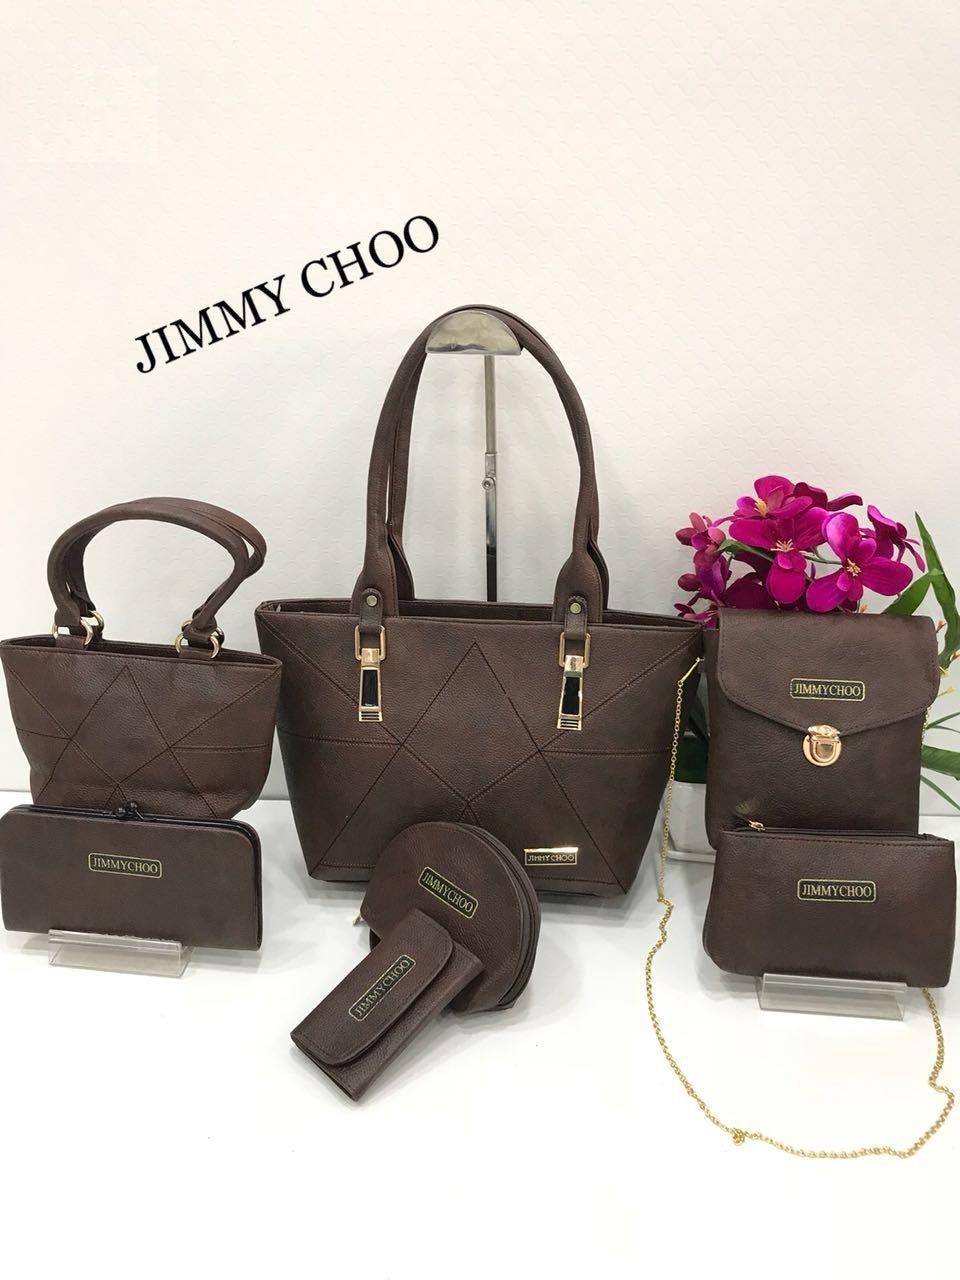 e78b3f532f9e JIMMY CHOO Ladies Purse Combo AVAILABLE COLORS Jimmy Choo Combo Set of 7  Size 14x10(